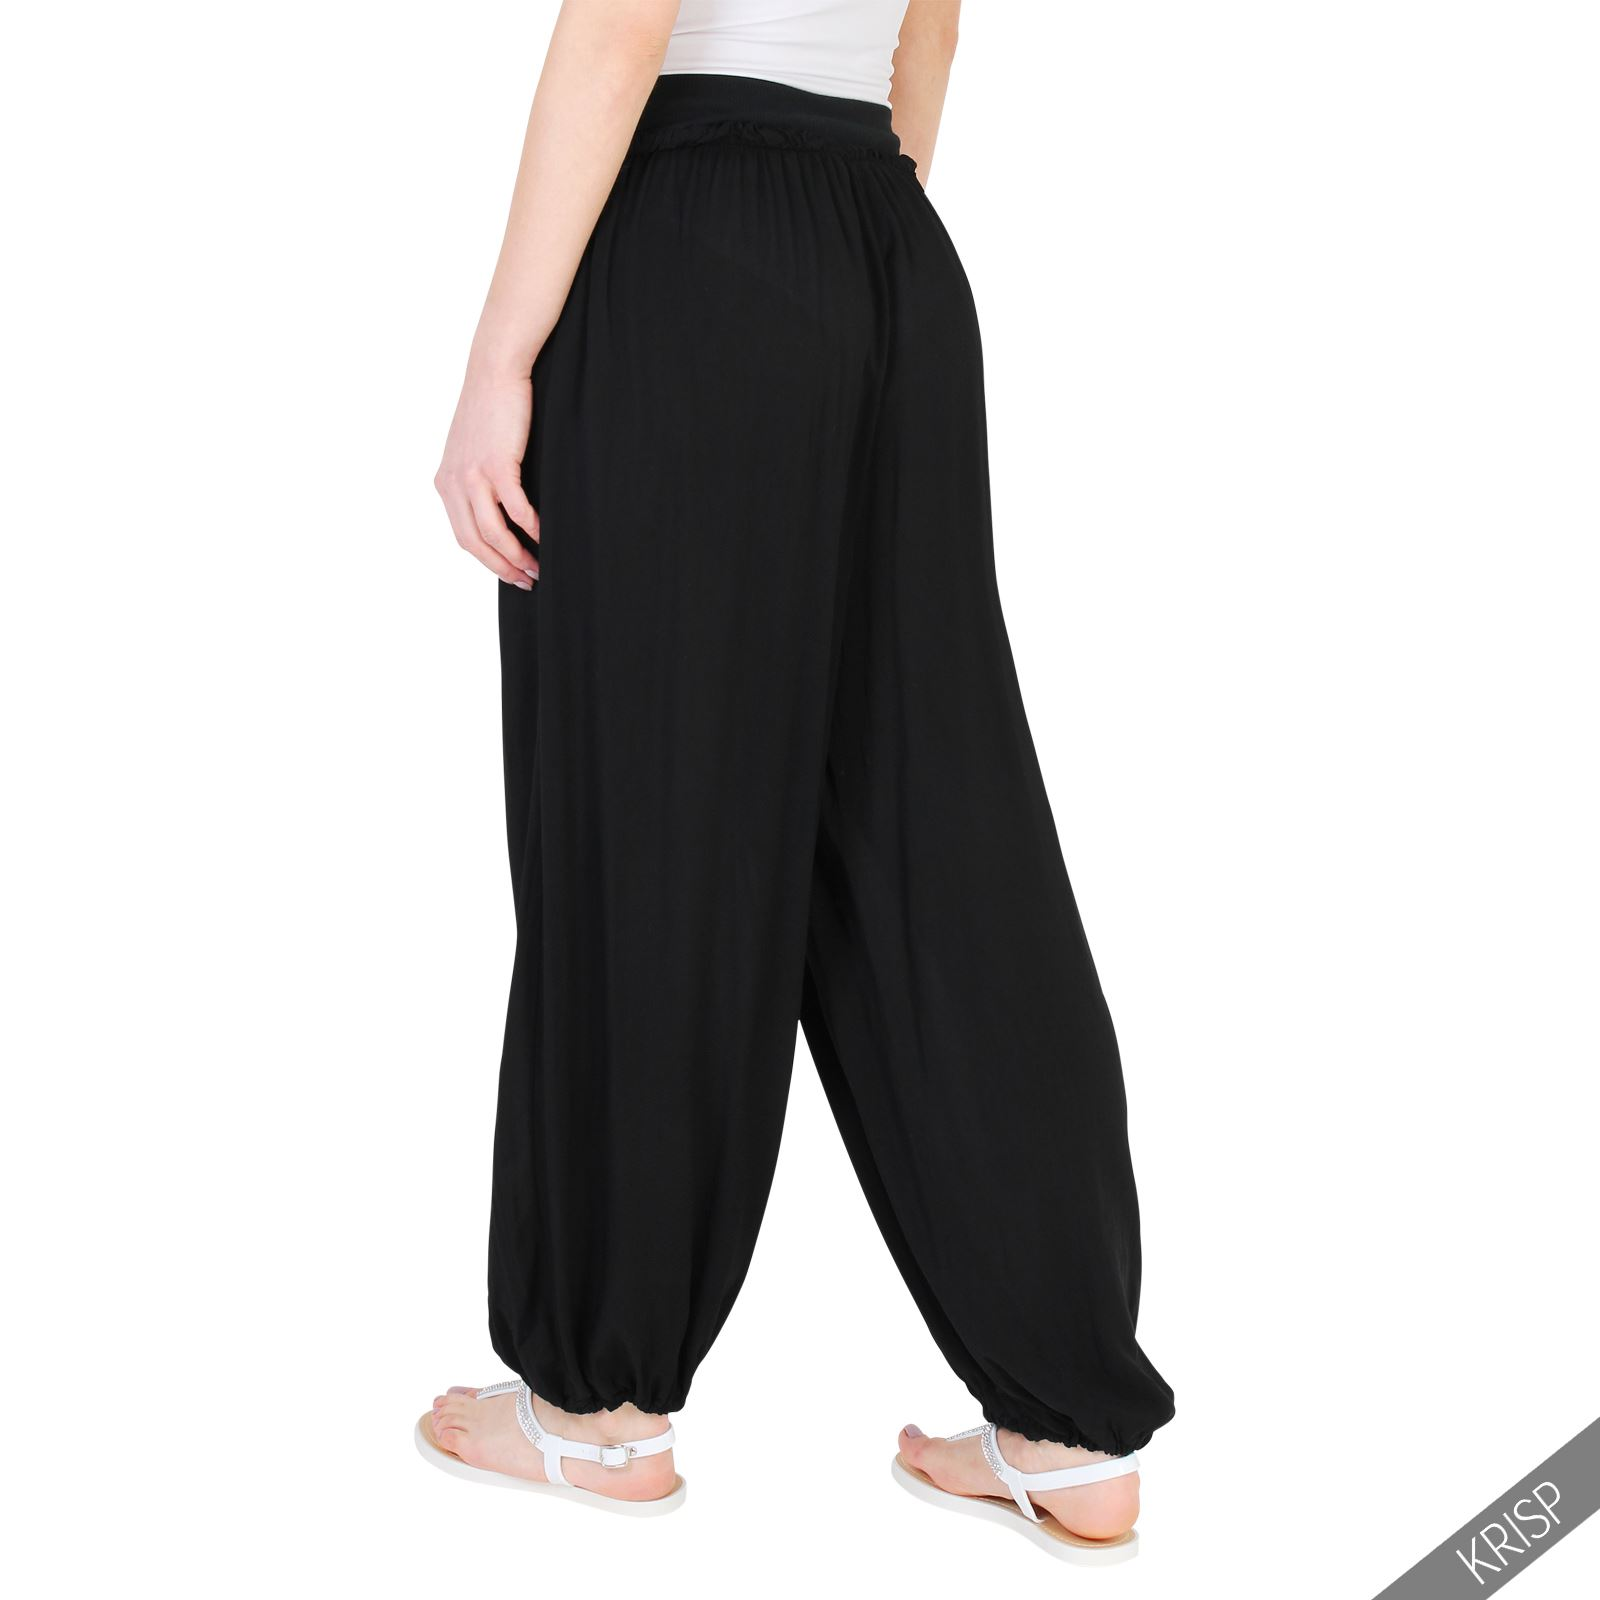 Creative Gypsy Hippie Aladdin Hmong Genie Hammer Baggy Men Women Harem Pants Trousers   EBay